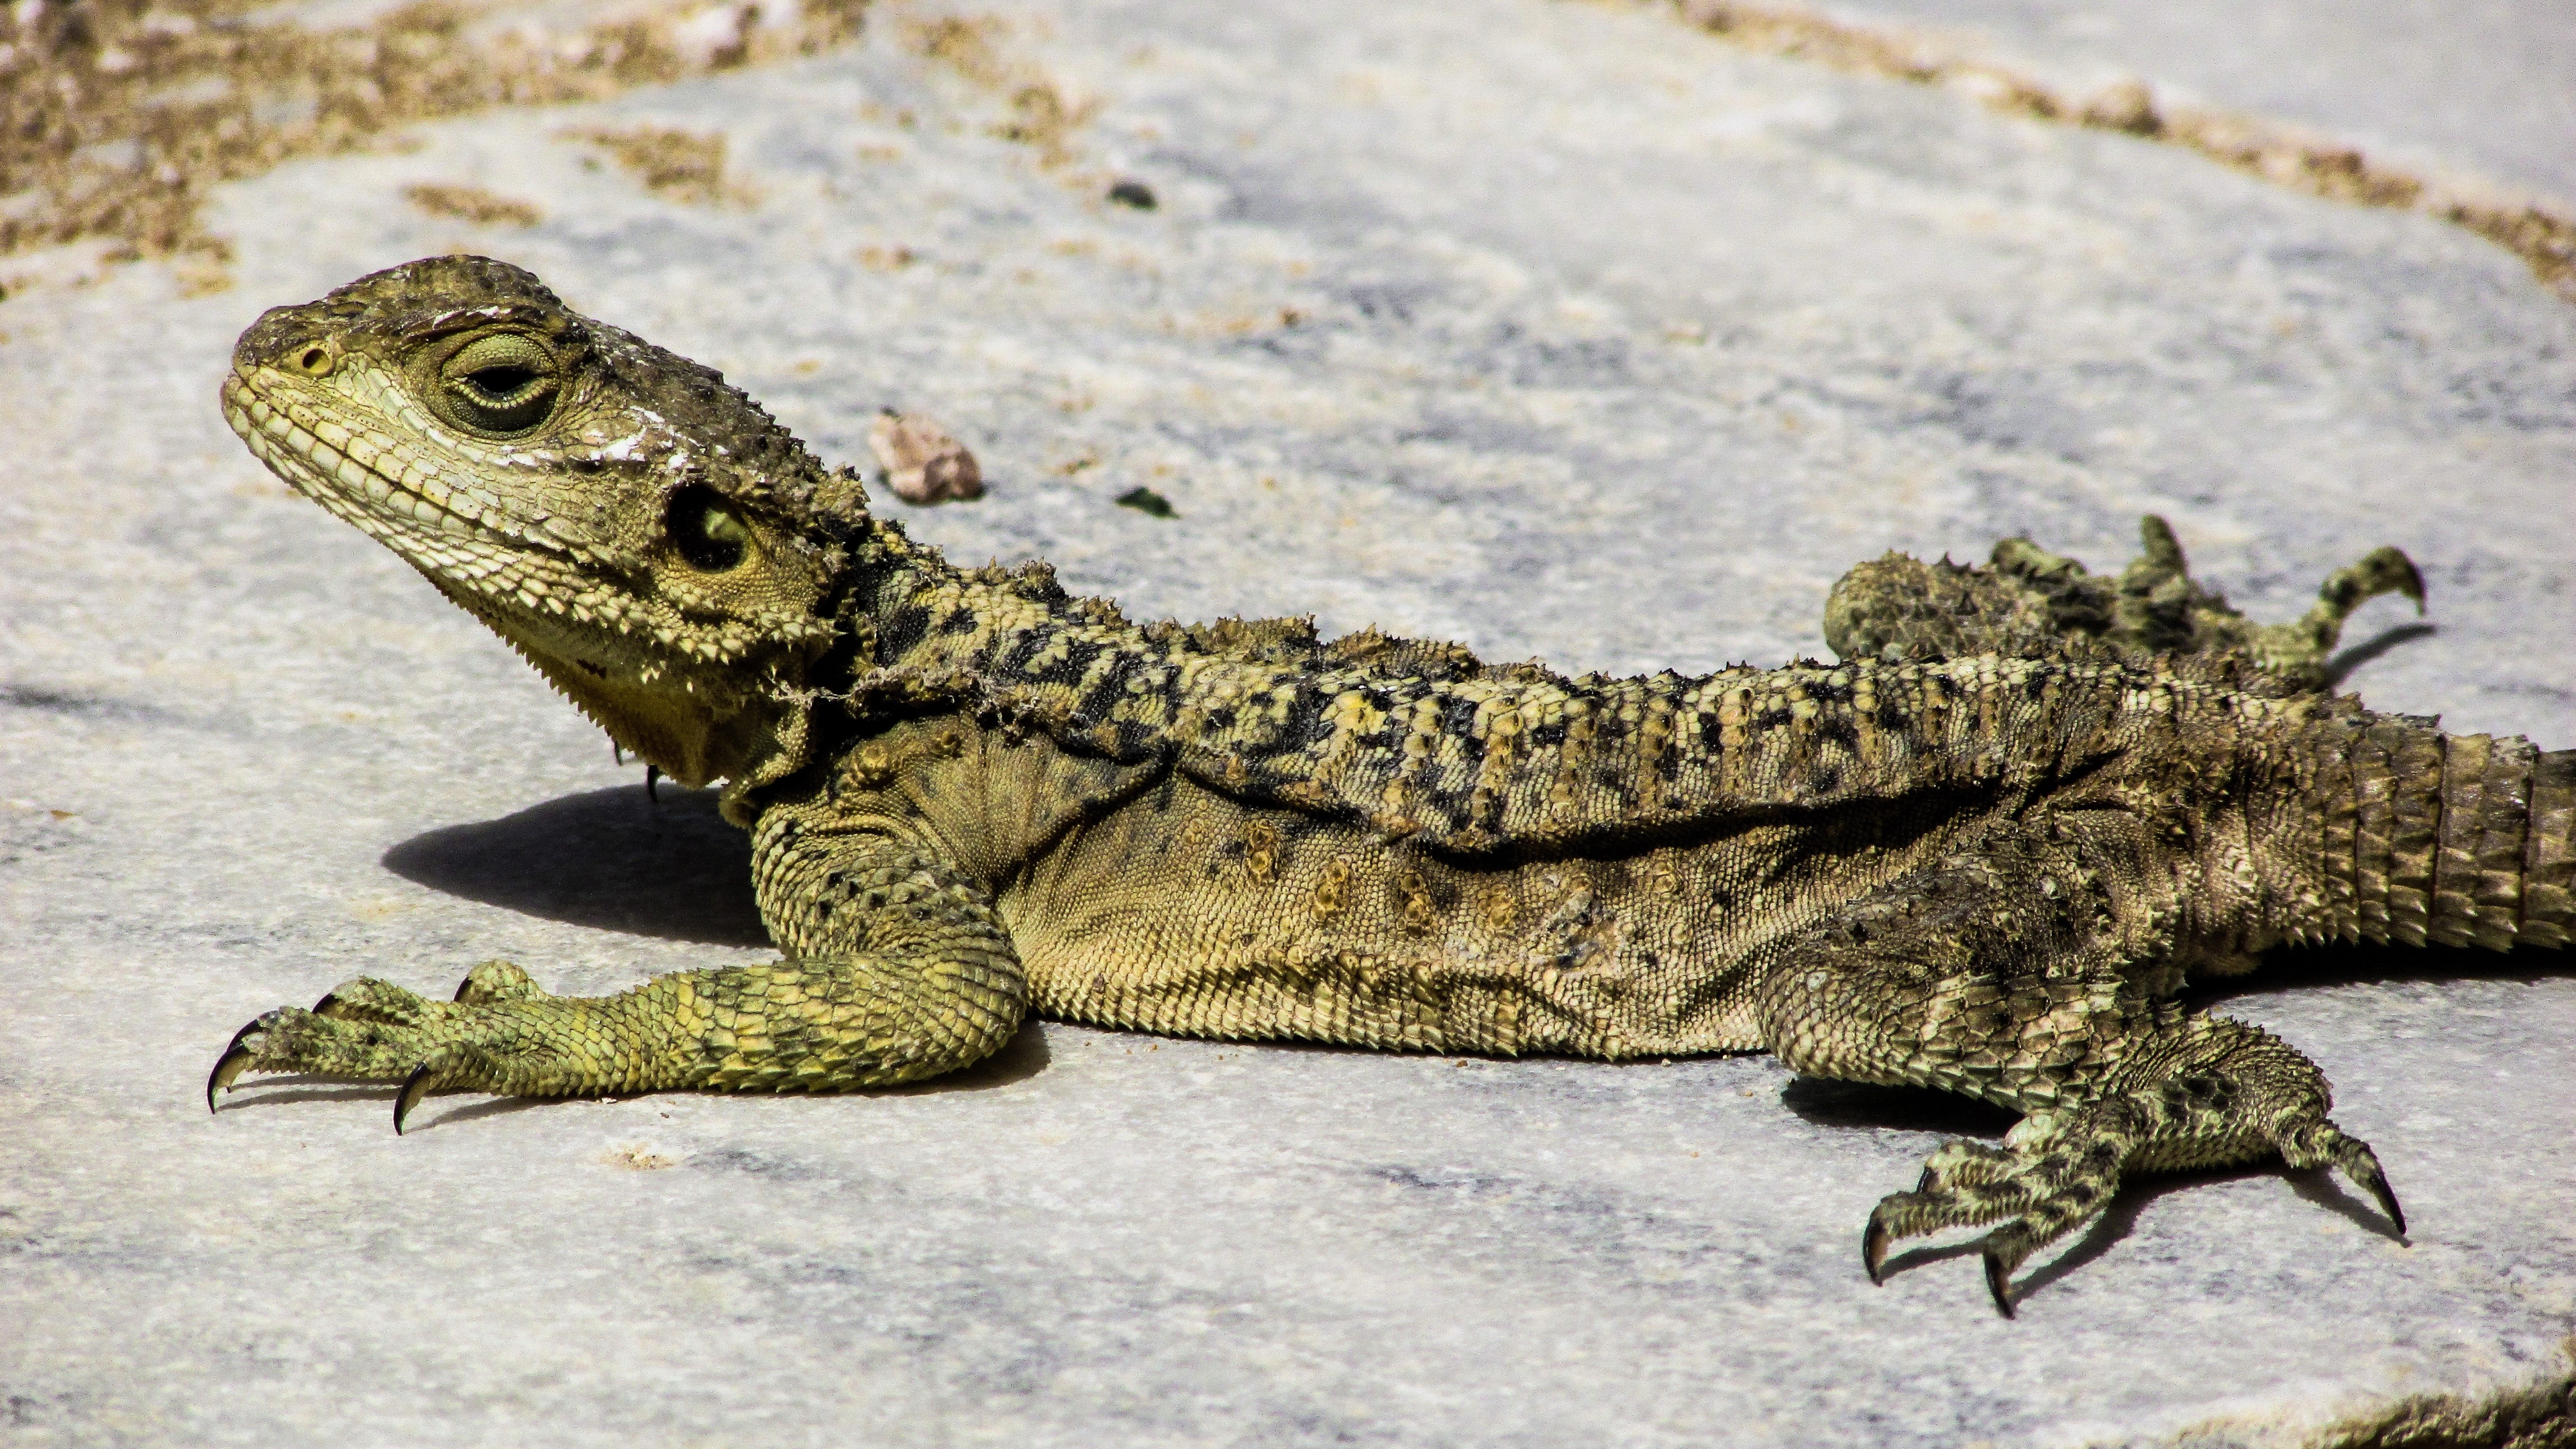 lizard reptile cyprus 4k 1542242921 - lizard, reptile, cyprus 4k - reptile, Lizard, cyprus